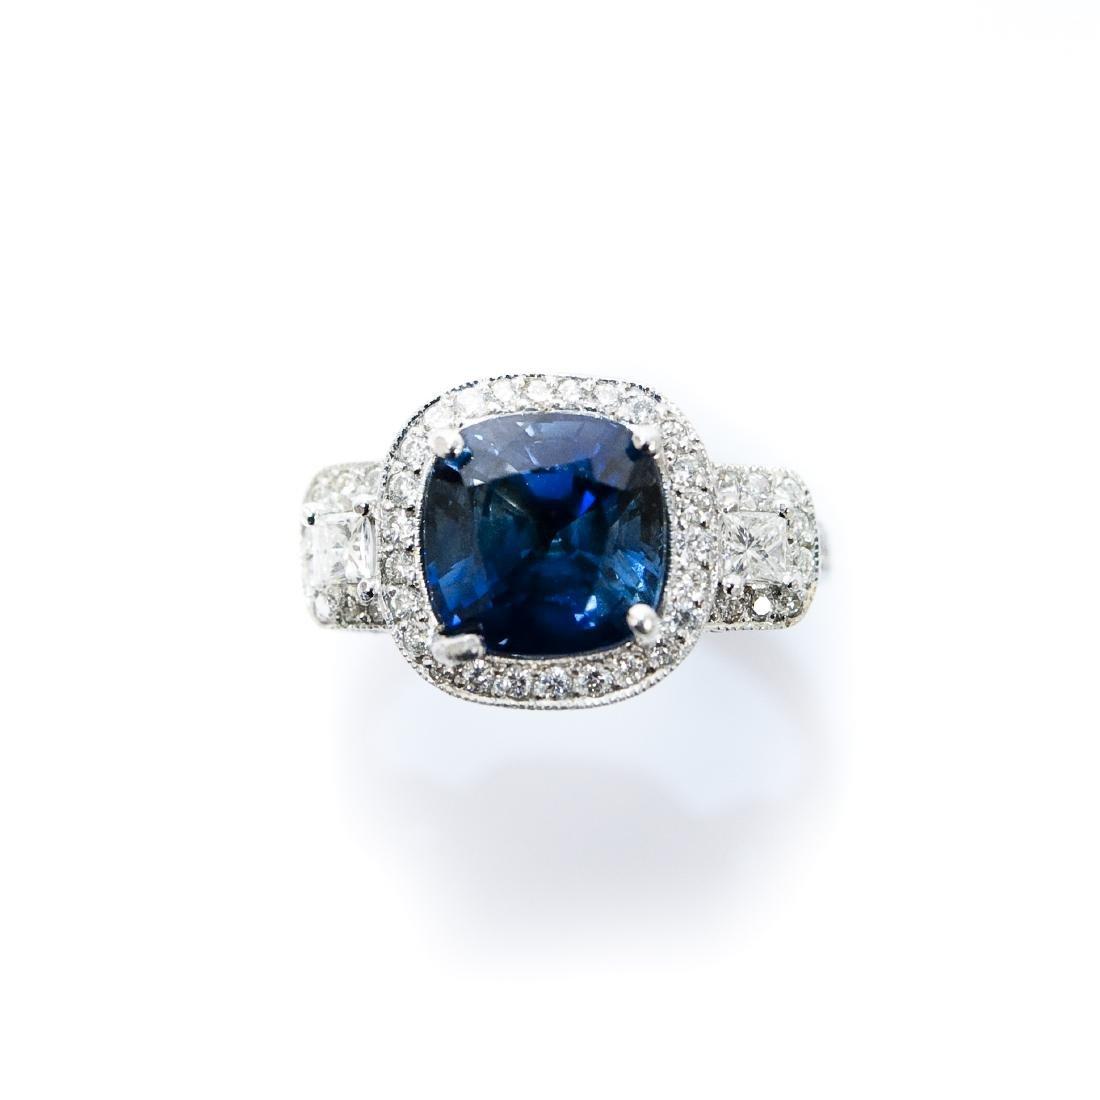 Ladies Platinum, Diamond and Sapphire Ring.